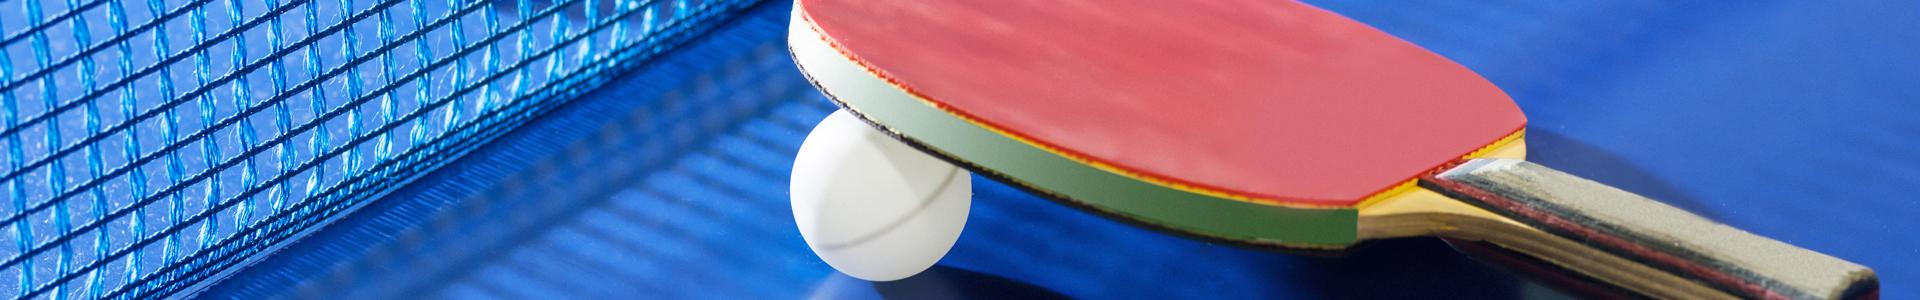 SCPP Tischtennis